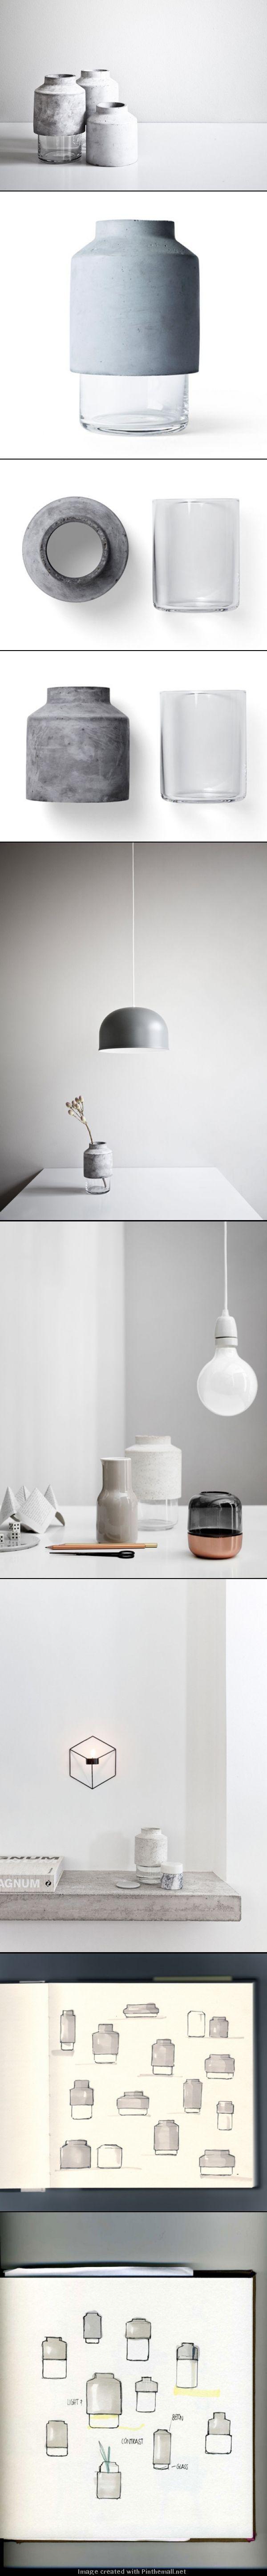 Concrete vase | Concrete product design | Cement | WIllman design | Beton design | Betonlook | www.eurocol.com: